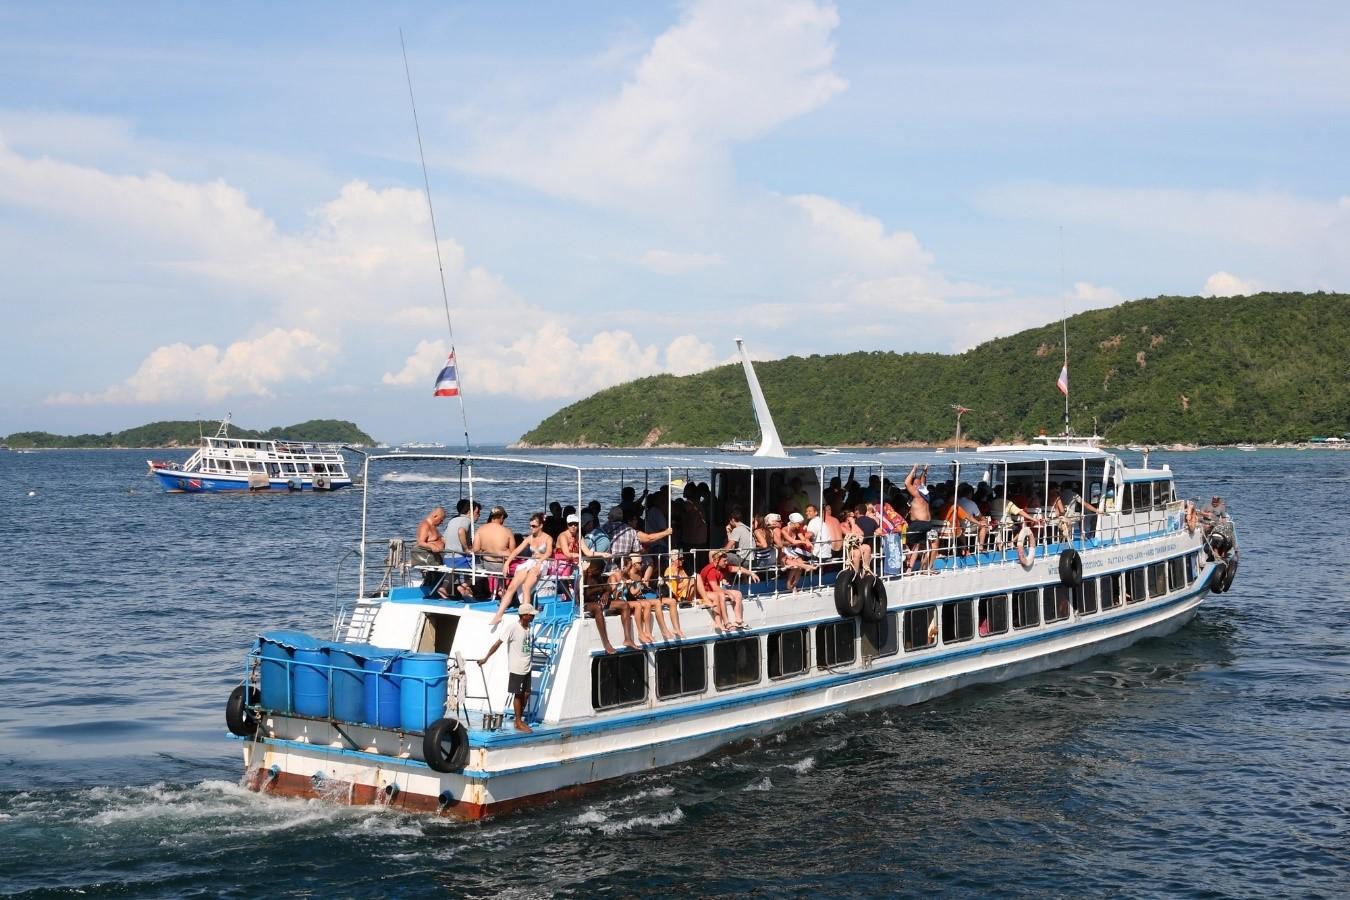 las playas de bangkok koh sichang ferry